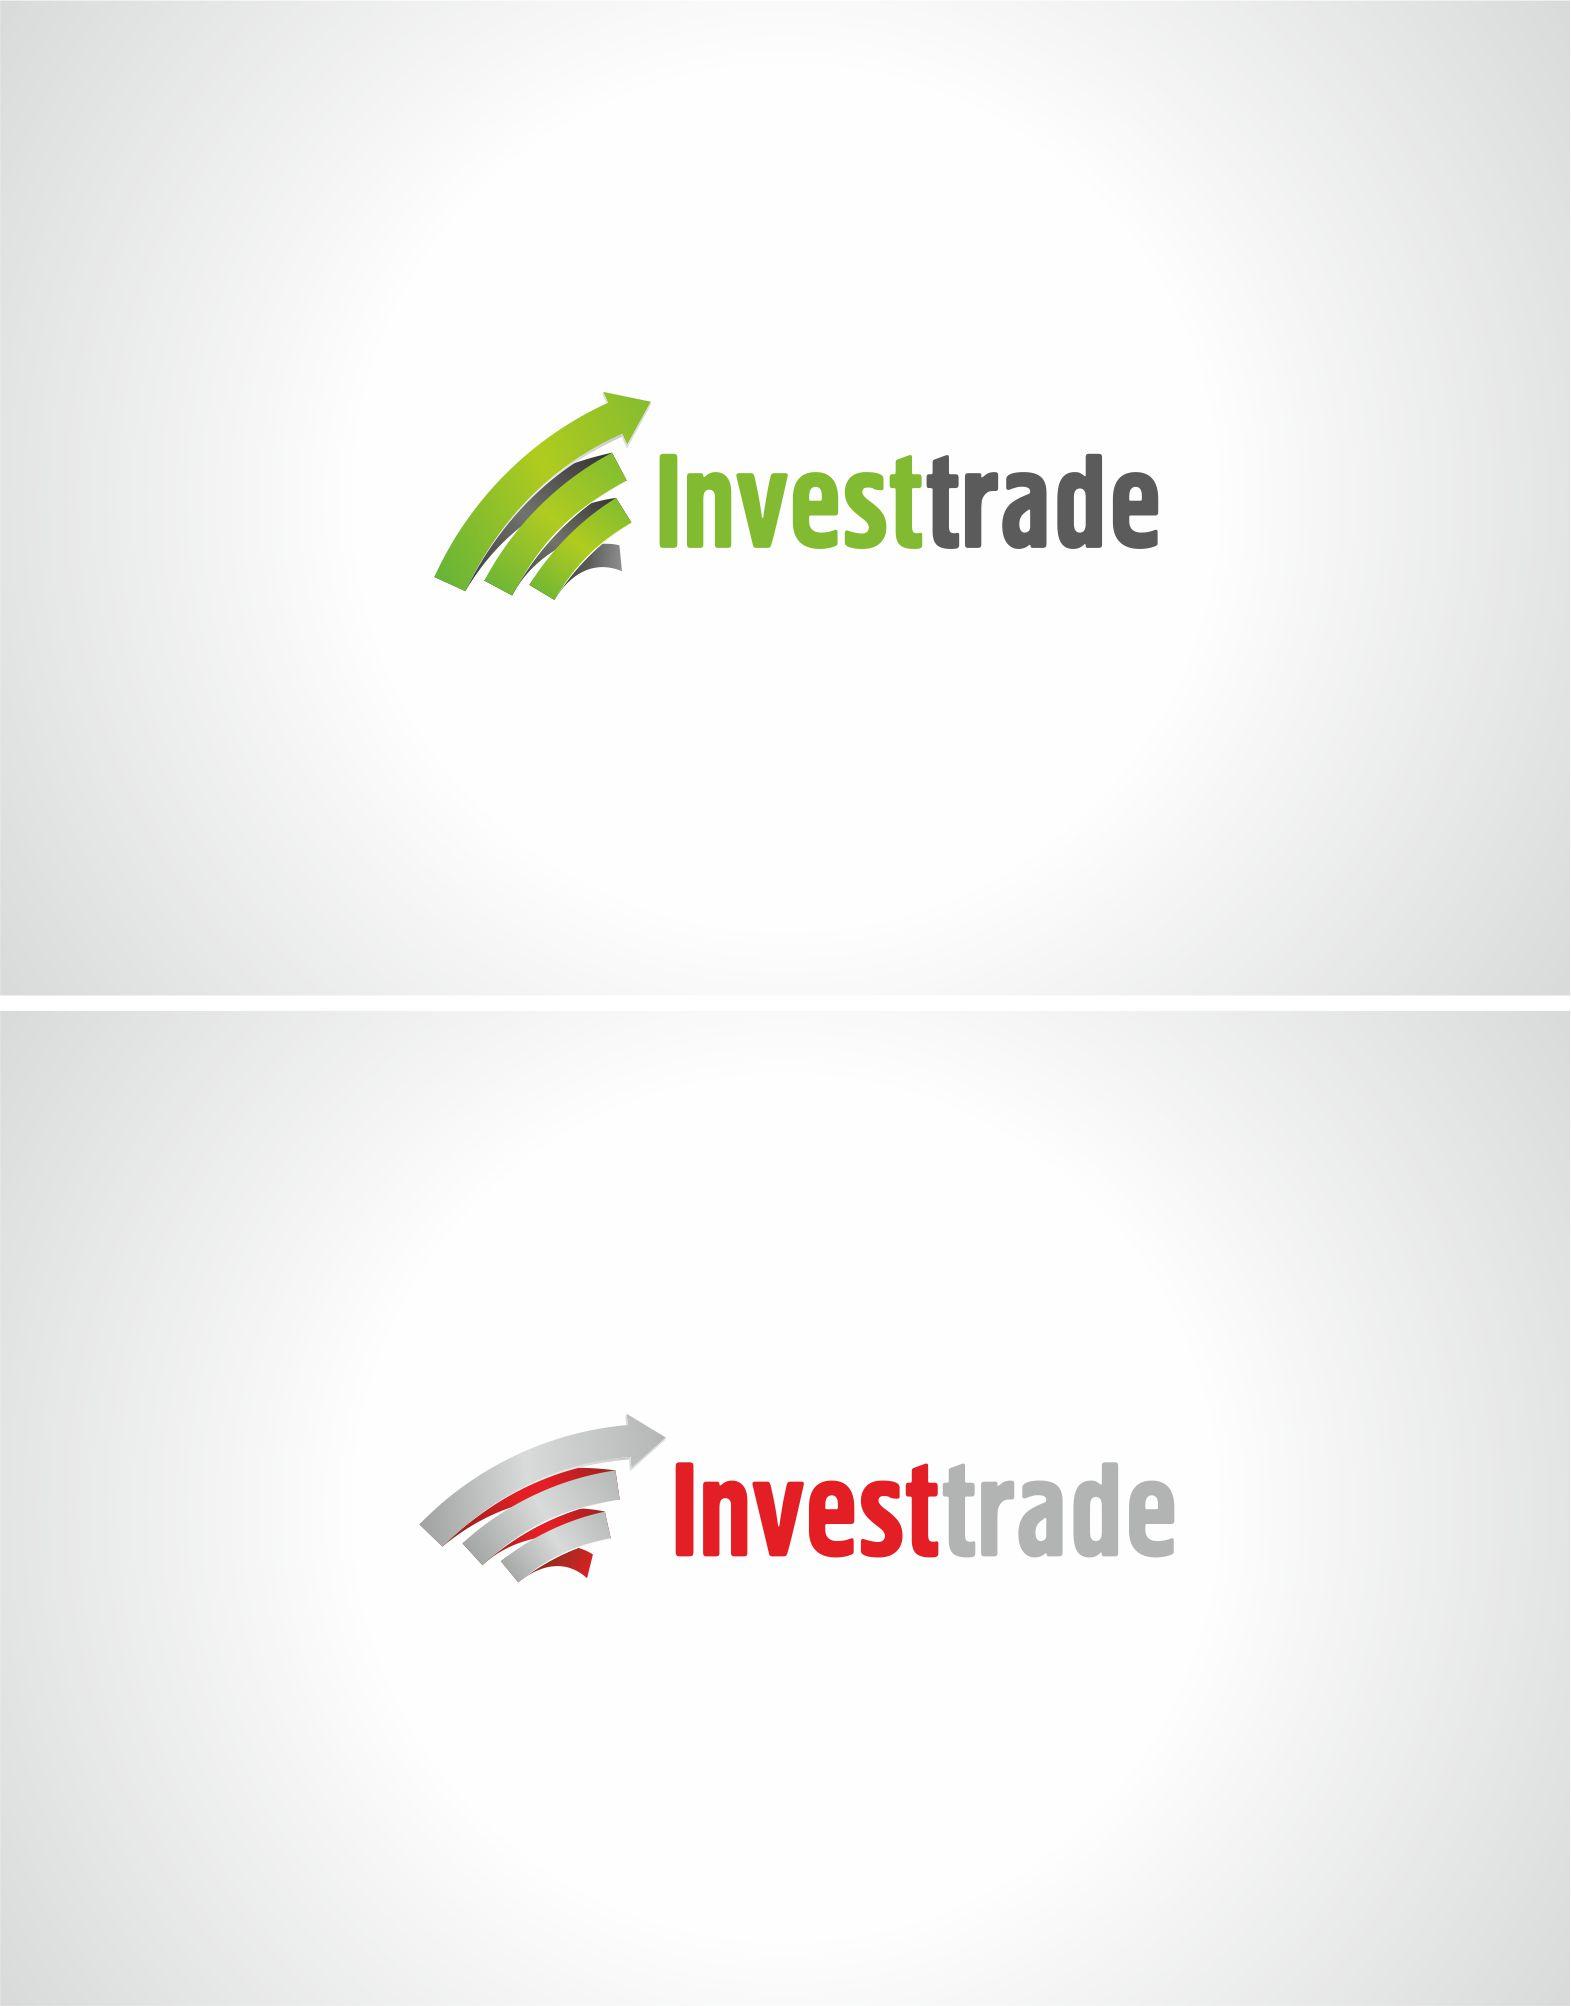 Разработка логотипа для компании Invest trade фото f_5475120ae07a8edb.jpg